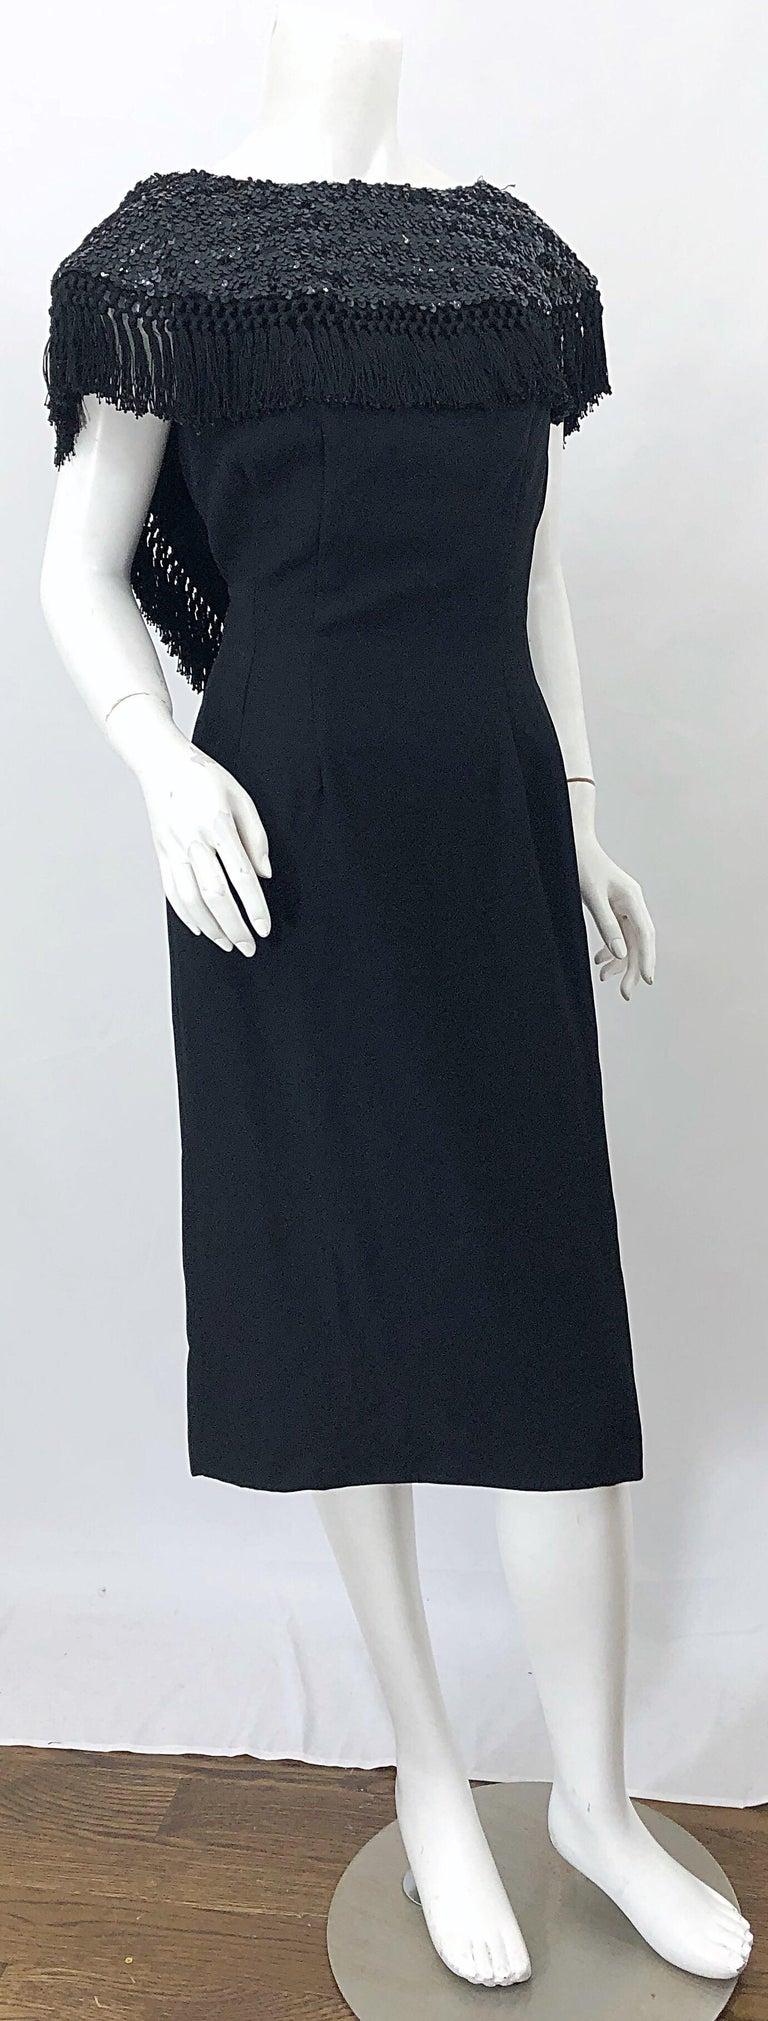 1950s Demi Couture Black Silk Crepe Dramatic Sequin Neck Fringe Vintage Dress For Sale 5